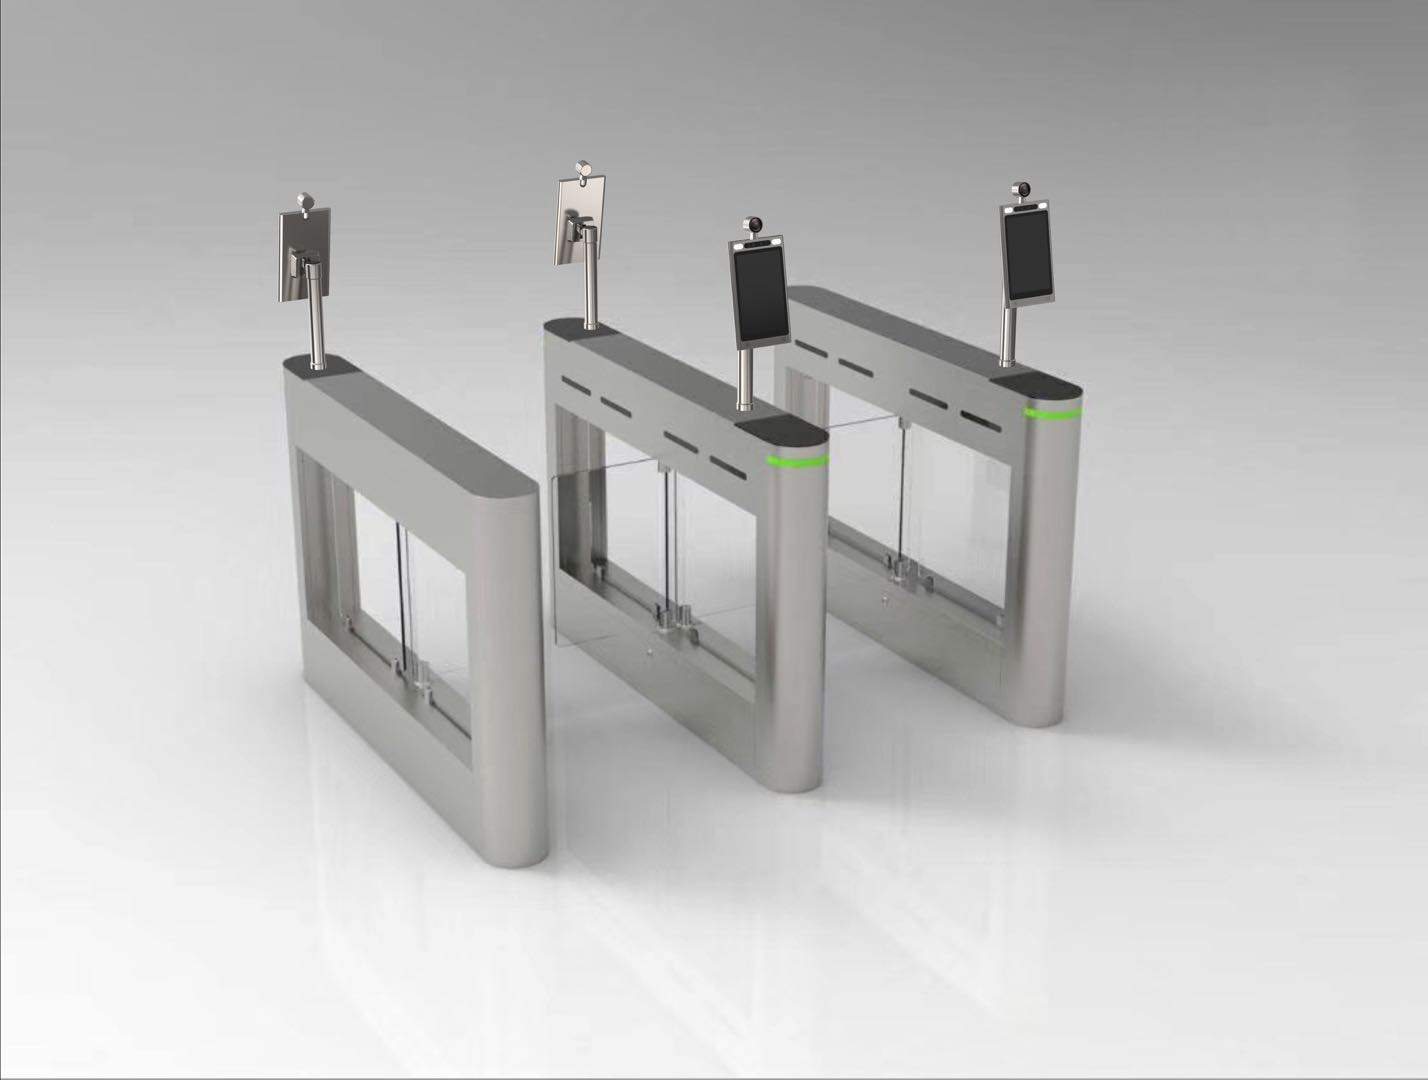 camara-termica-control-acceso